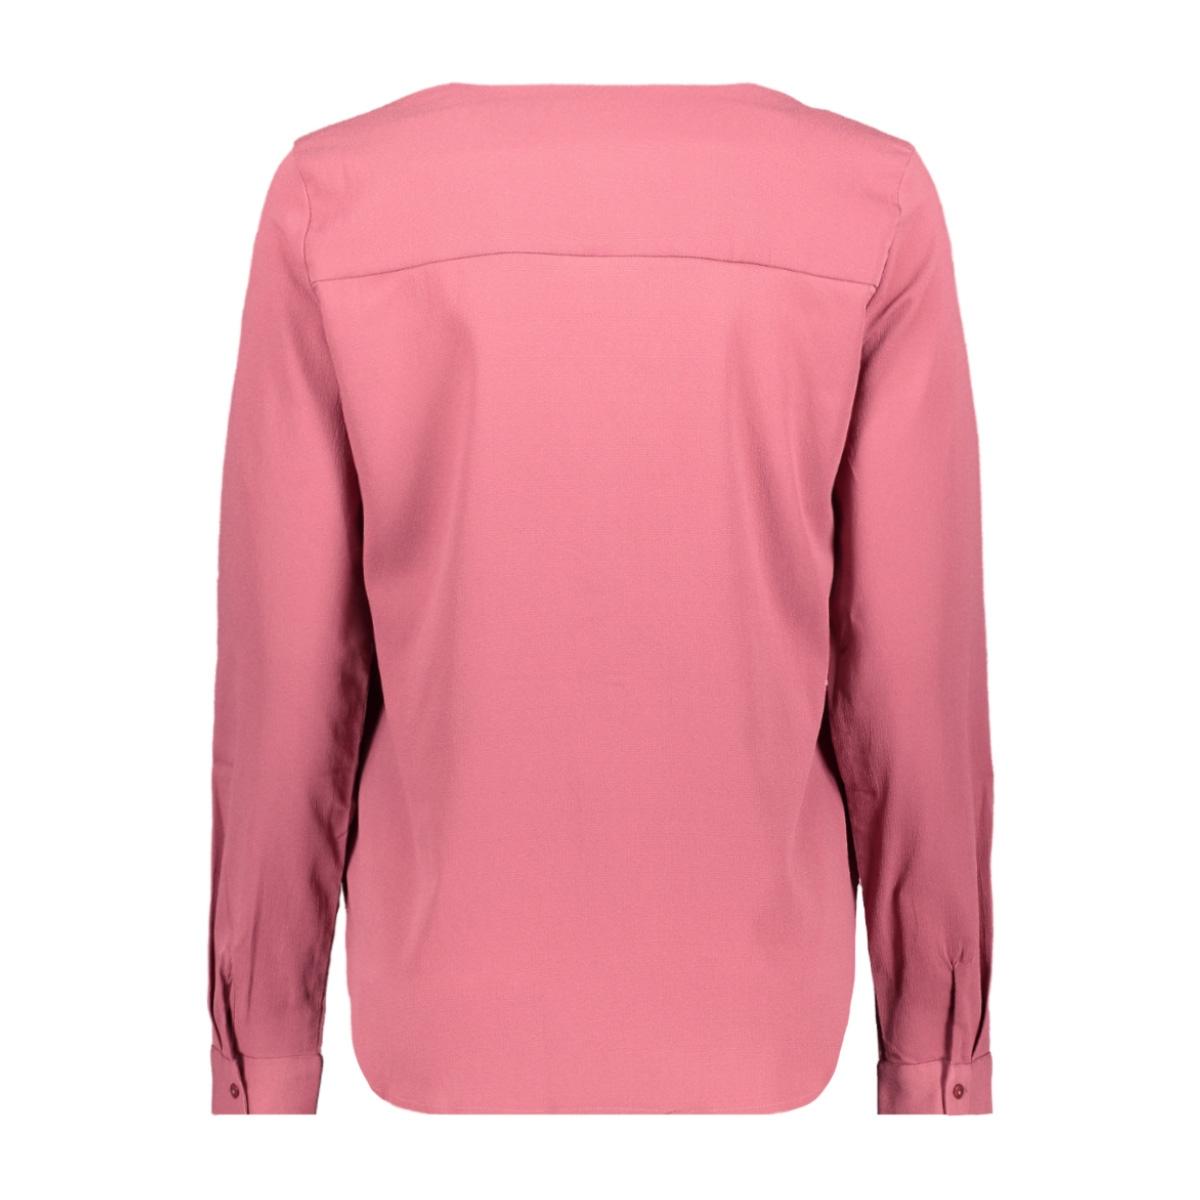 vmgrace l/s top exp 10211330 vero moda blouse hawthorn rose